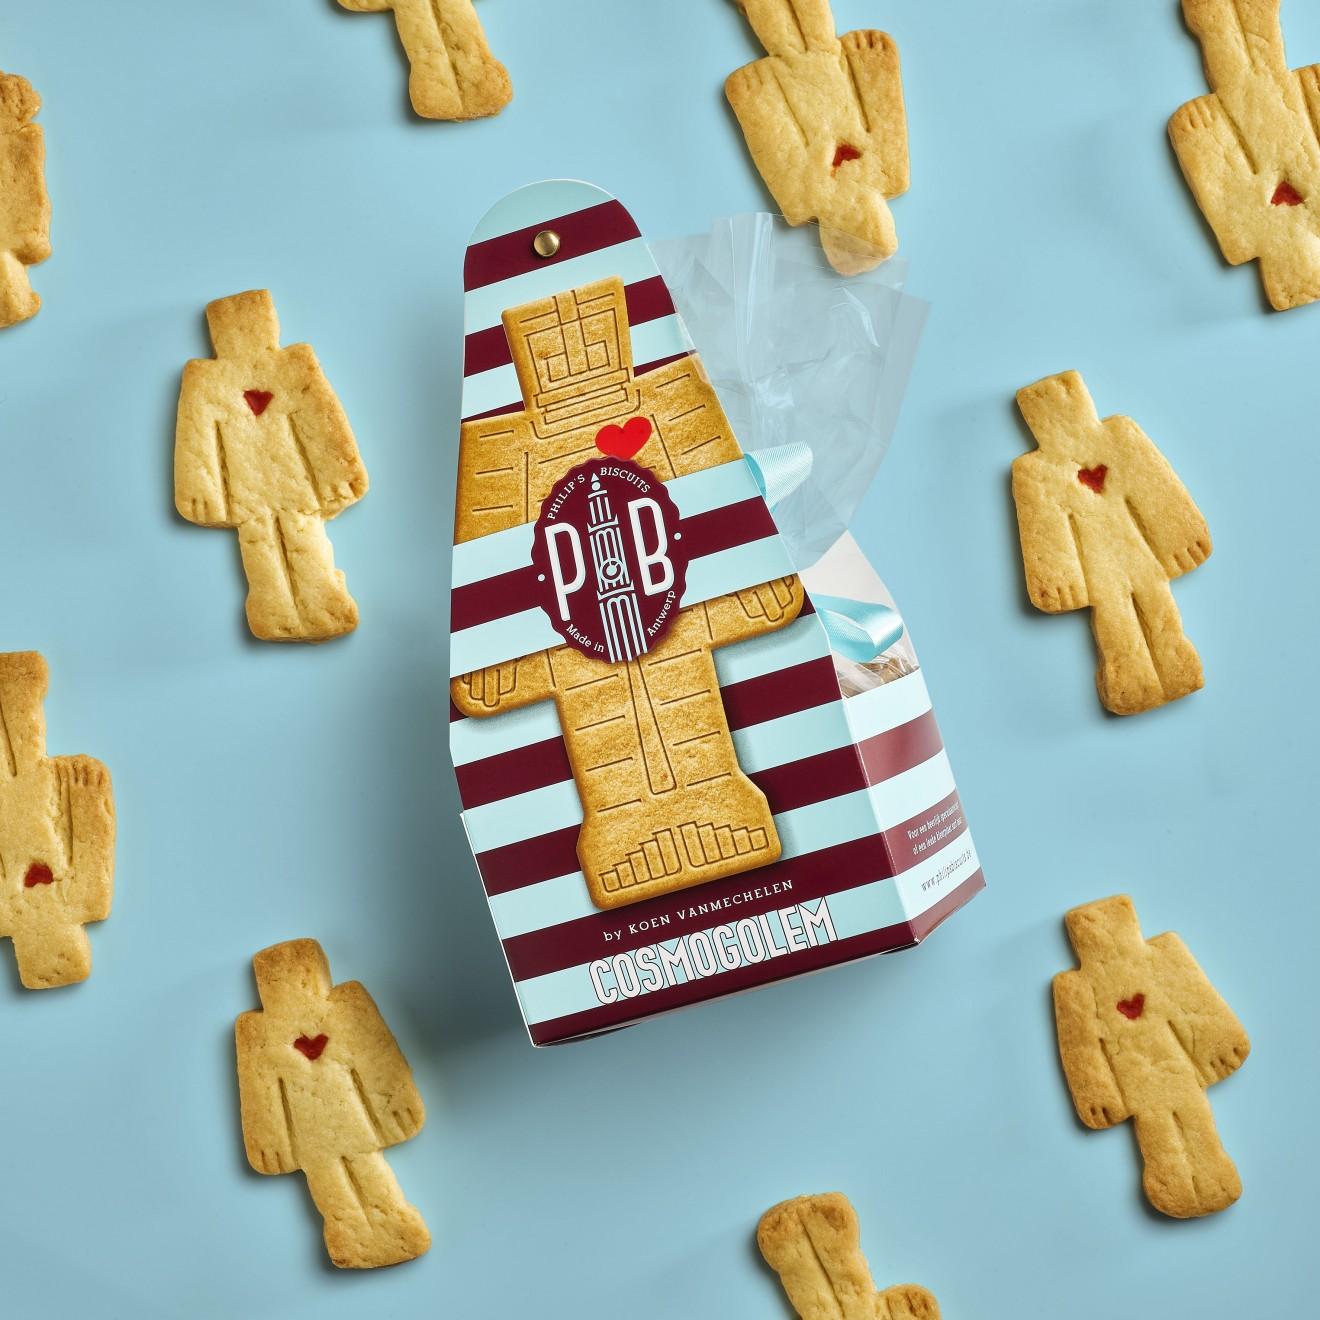 Quatre Mains package design - philips biscuits, cosmogolem